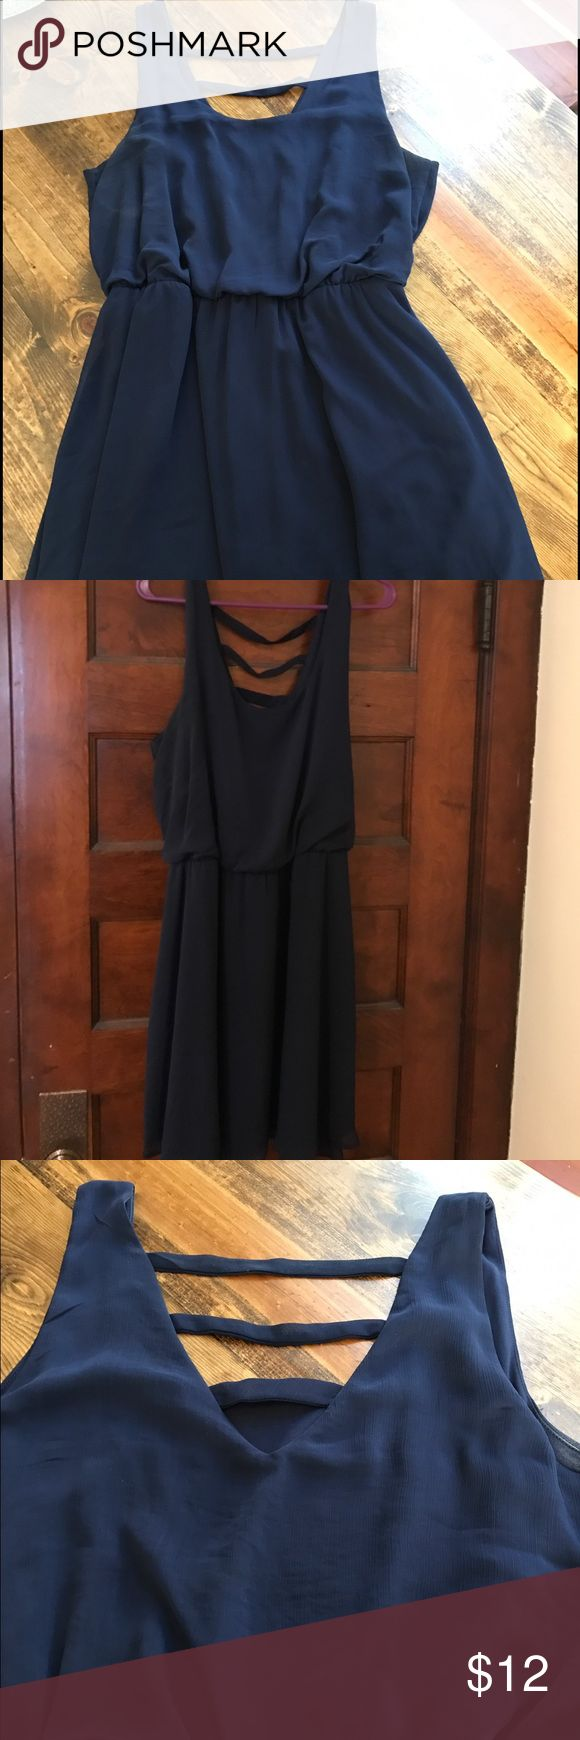 Navy short dress- Eyeshadow Sz XL Short, sleeveless, navy dress with strappy back. Elastic, clinched waist. Size XL, brand Eyeshadow. Worn once. Eyeshadow Dresses Mini